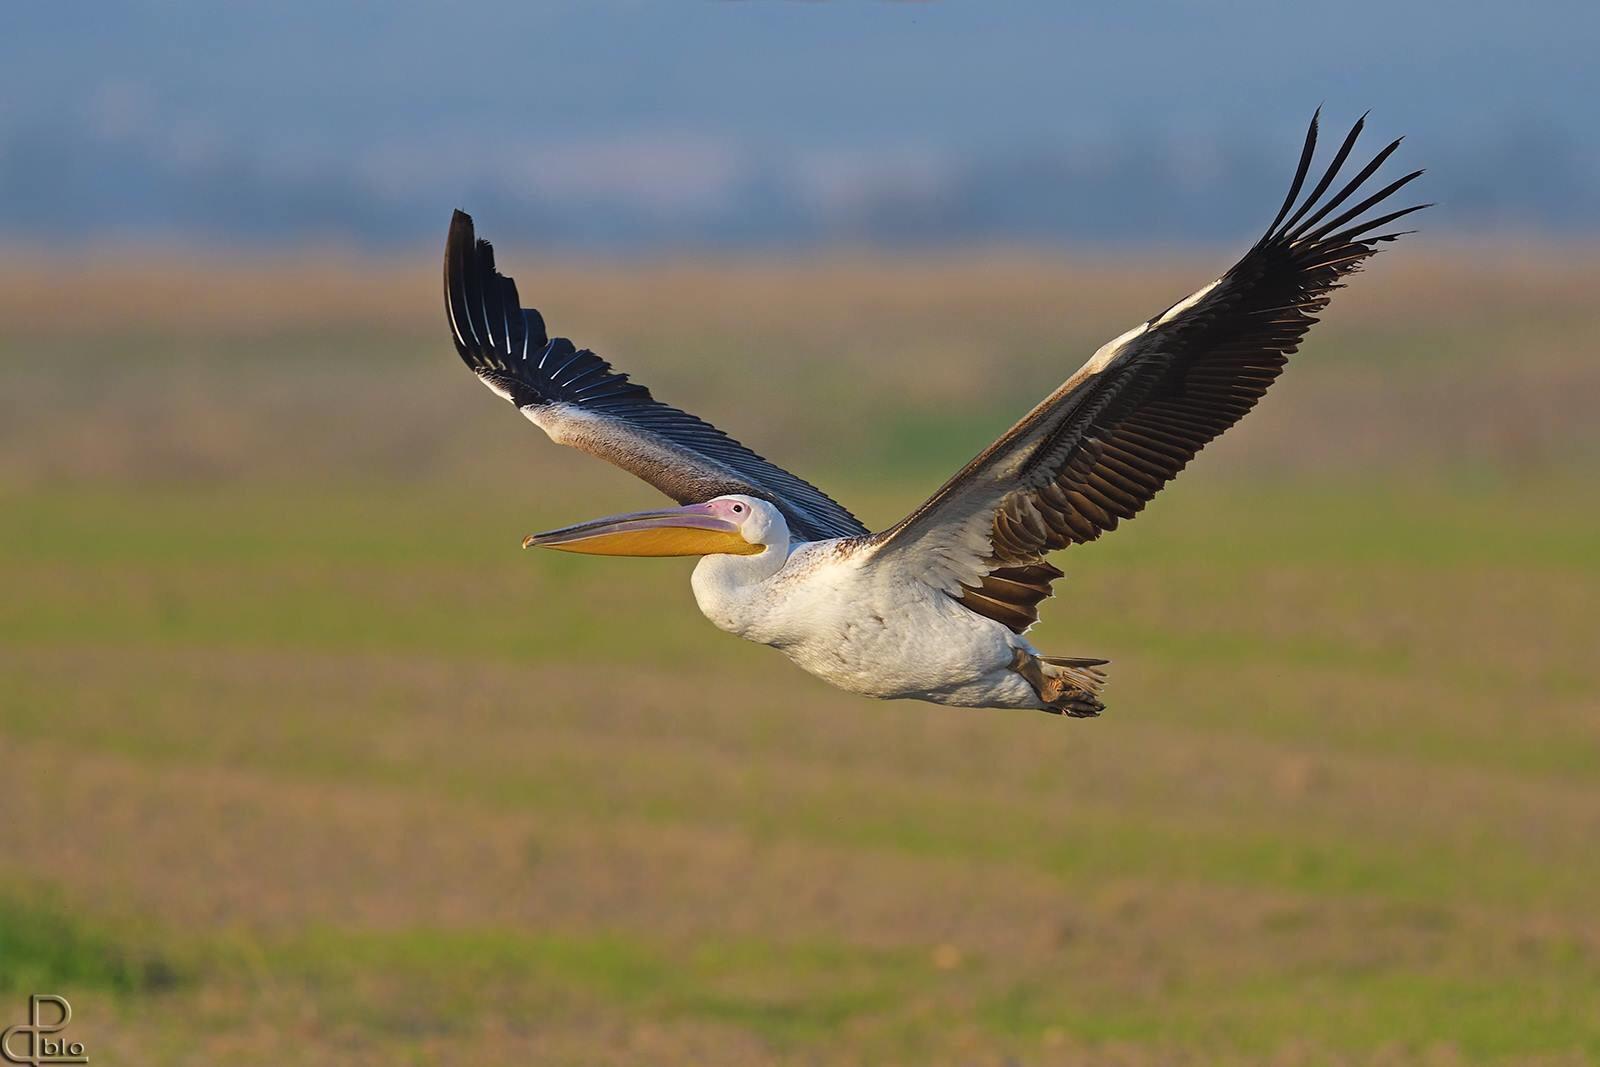 U15Ecc: decollano i pellicani